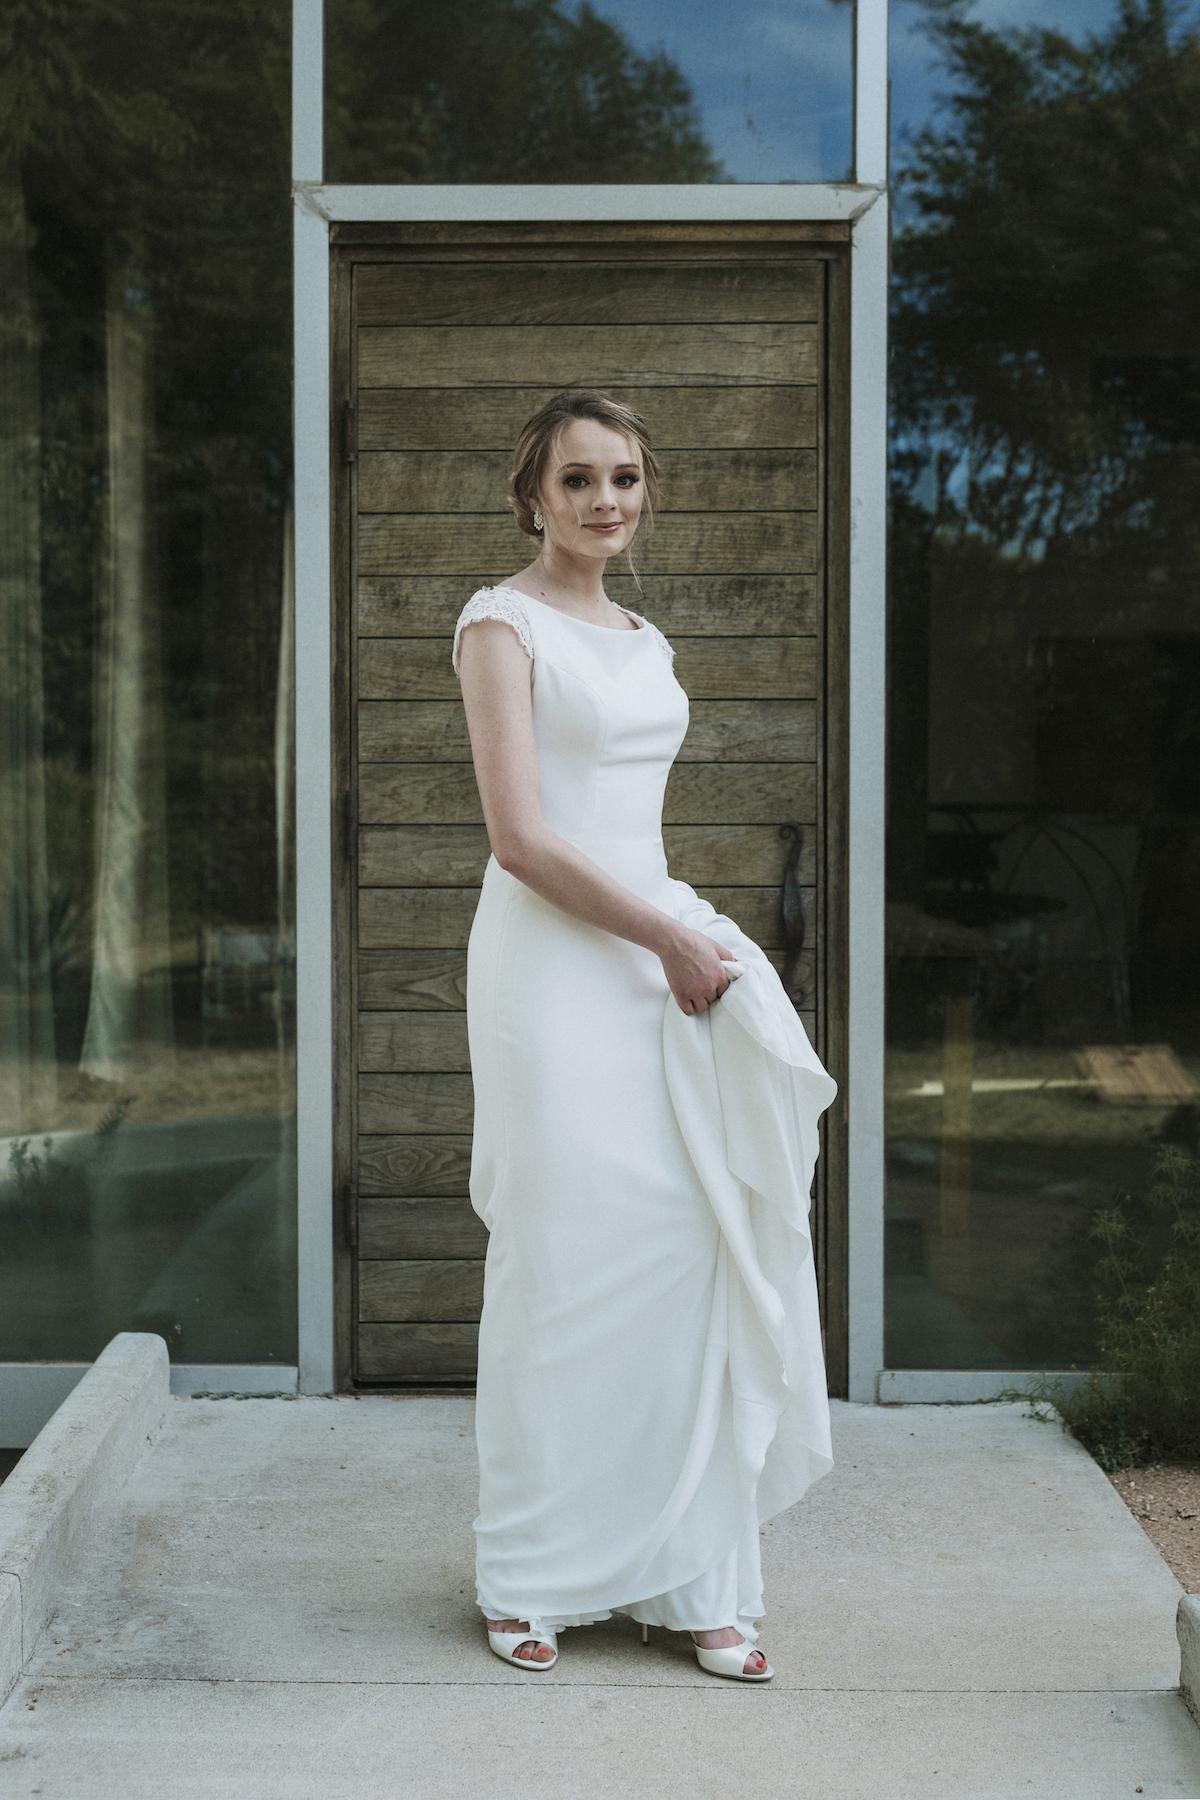 barr-mansion-bridal-photography24528.JPG